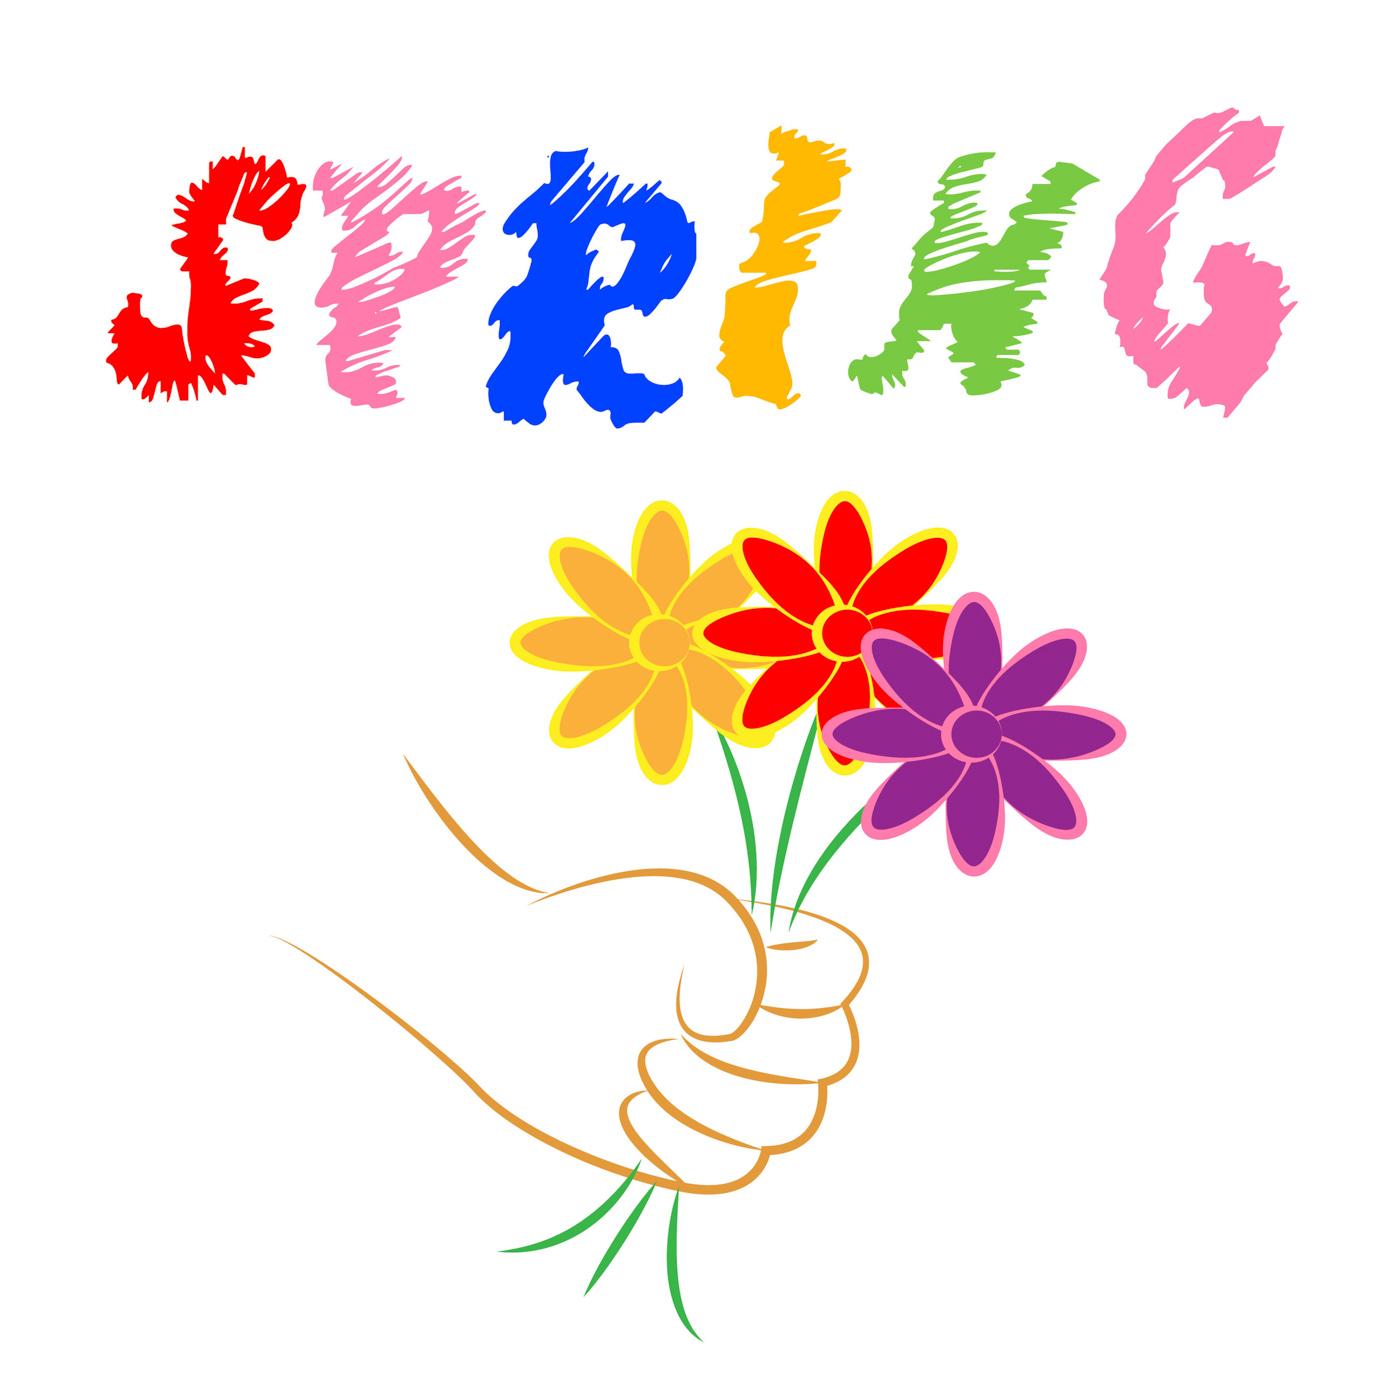 Spring Flowers Means Florist Season And Florals, Petal, Warm, Springtime, Springflowers, HQ Photo